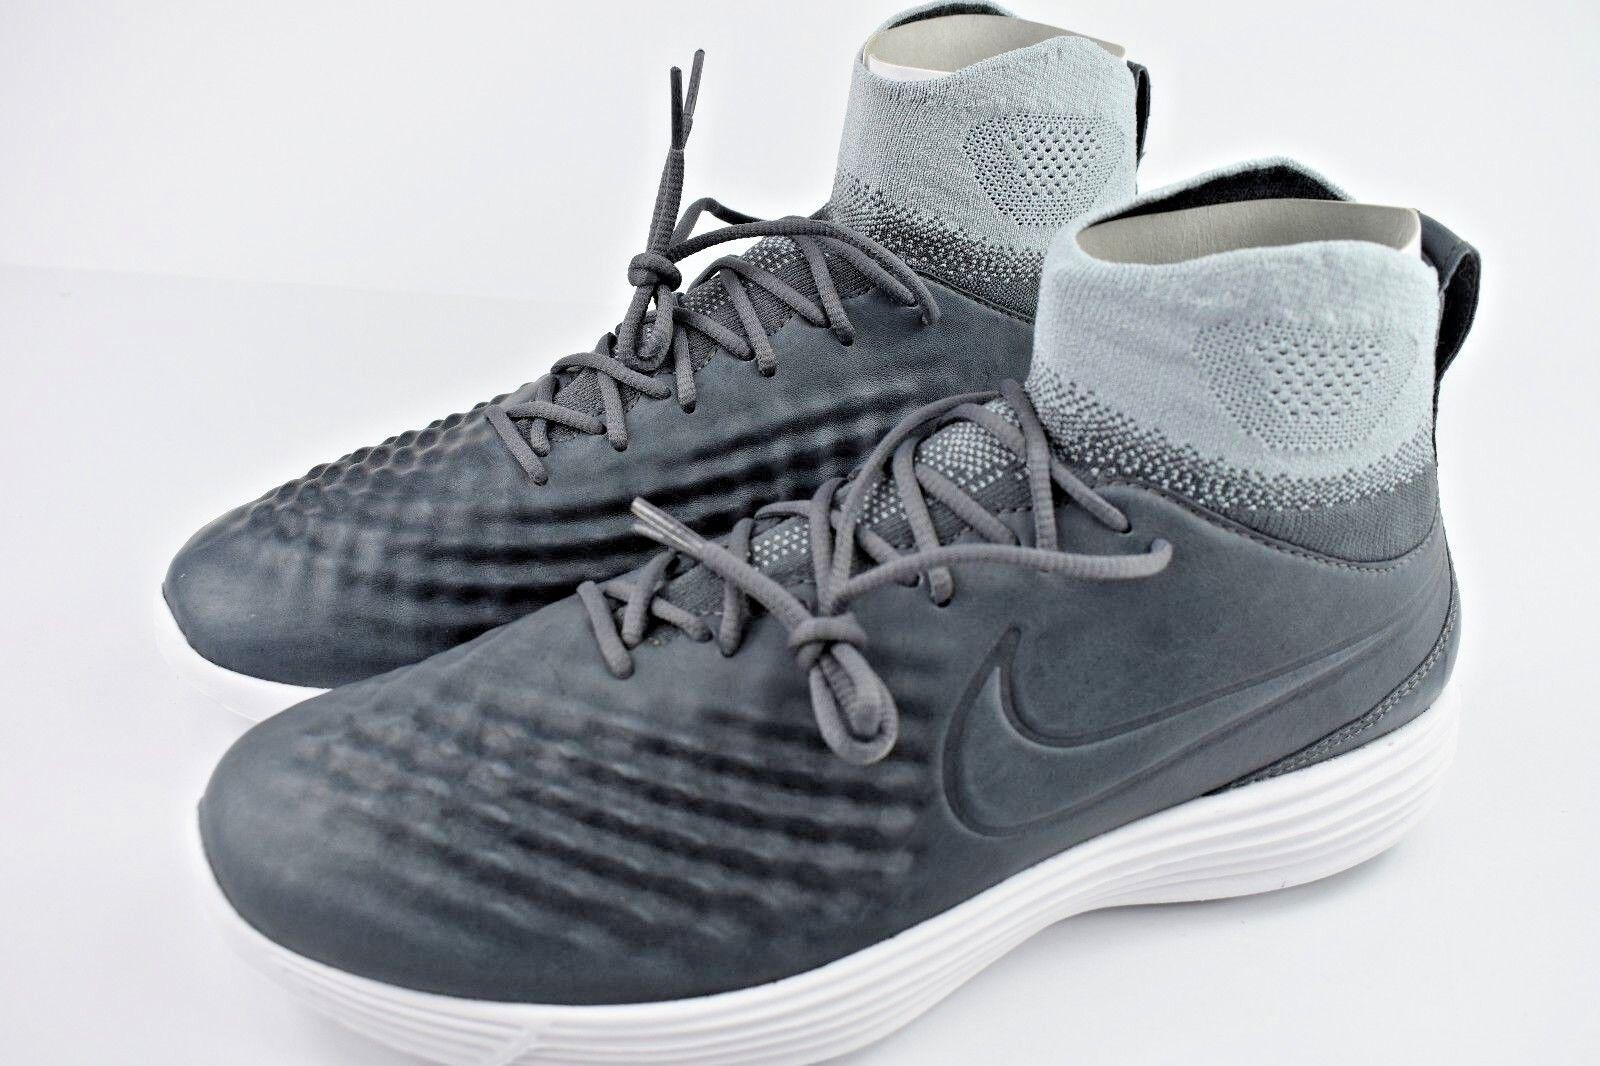 Nike Lunar Magista 2 II FK  Flyknit Mens Indoor Soccer Shoes 852614 002 Grey